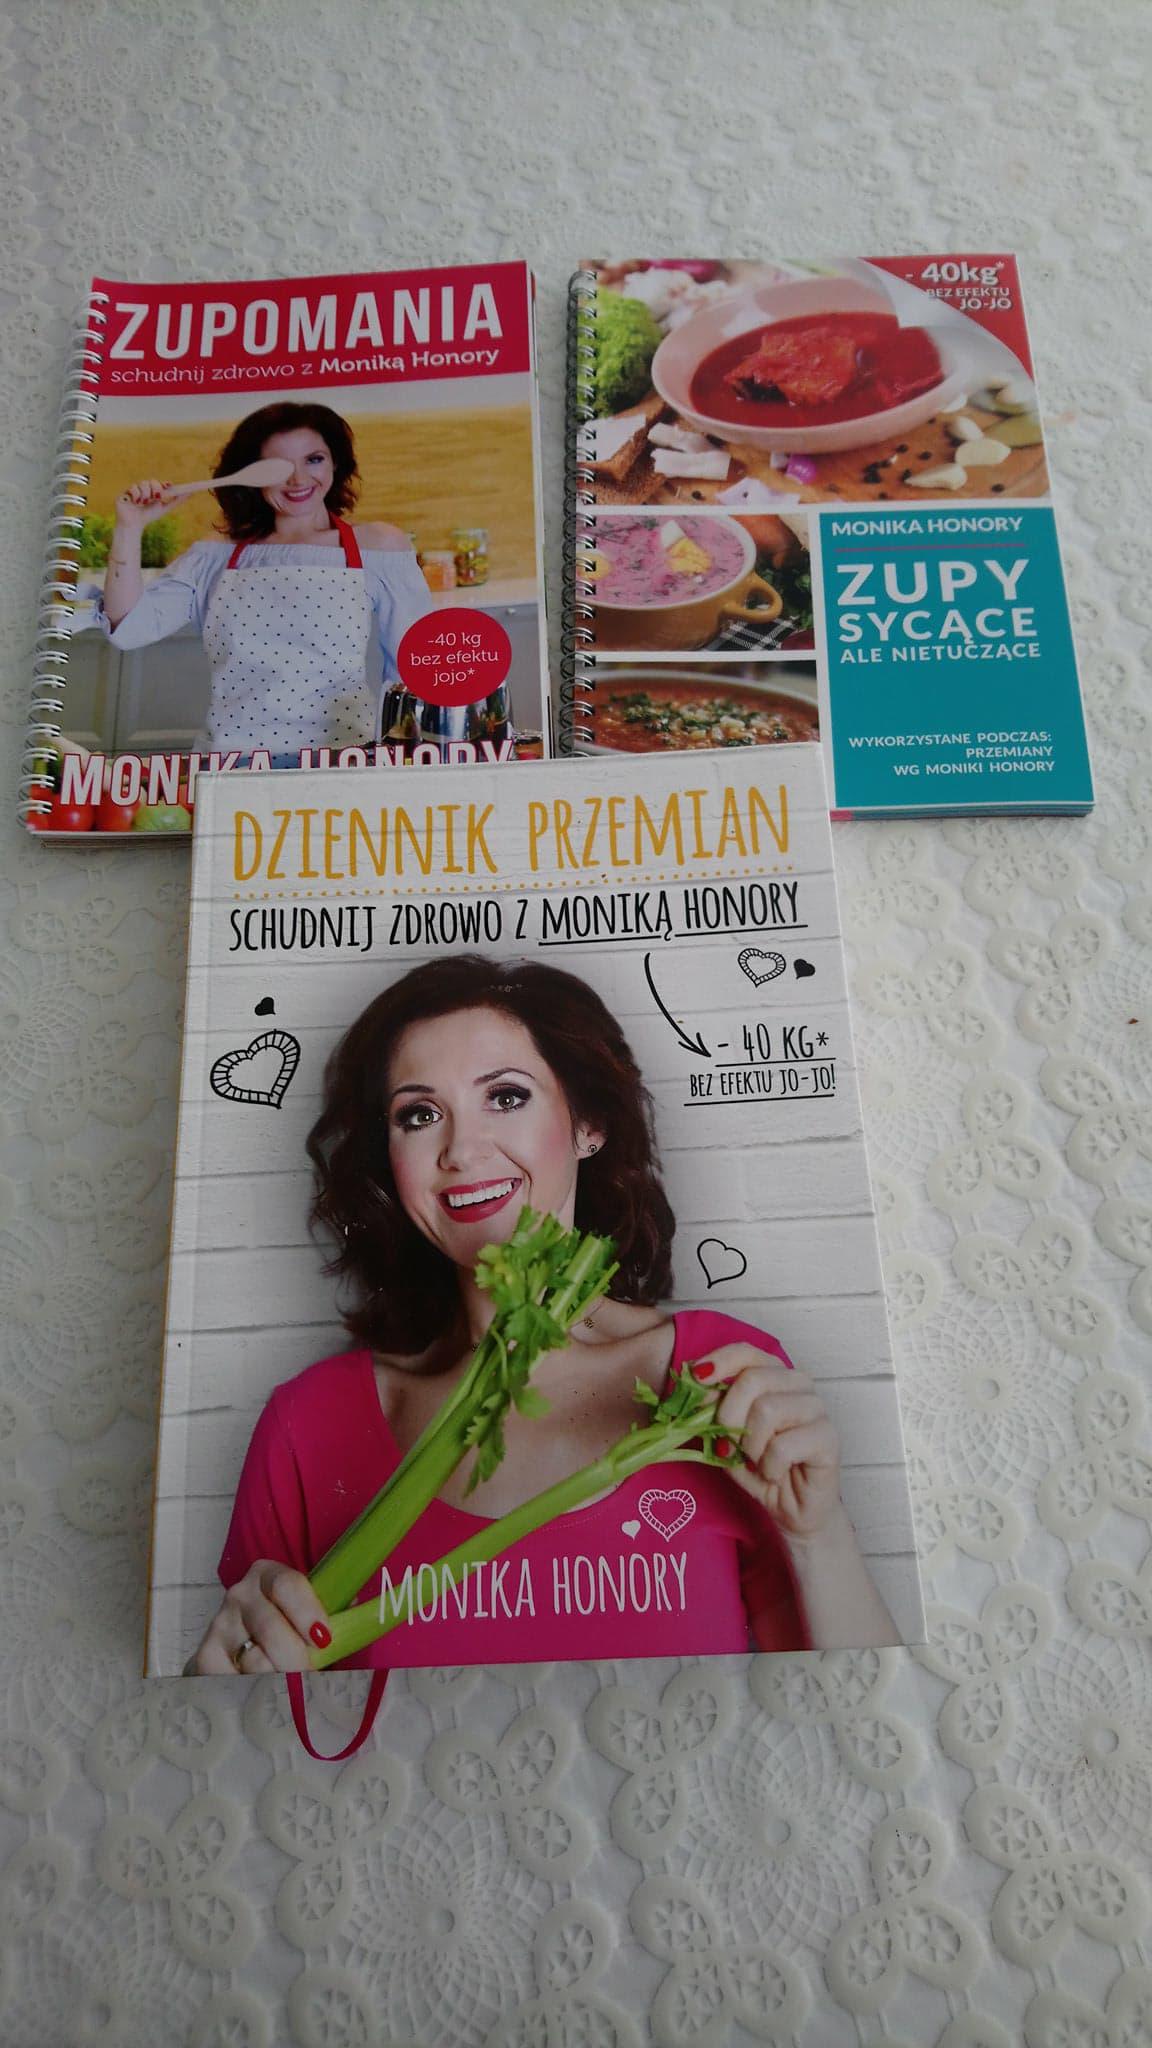 Monika Honory 3 Ksiazki Zupomania Zupy Sycace 7248113402